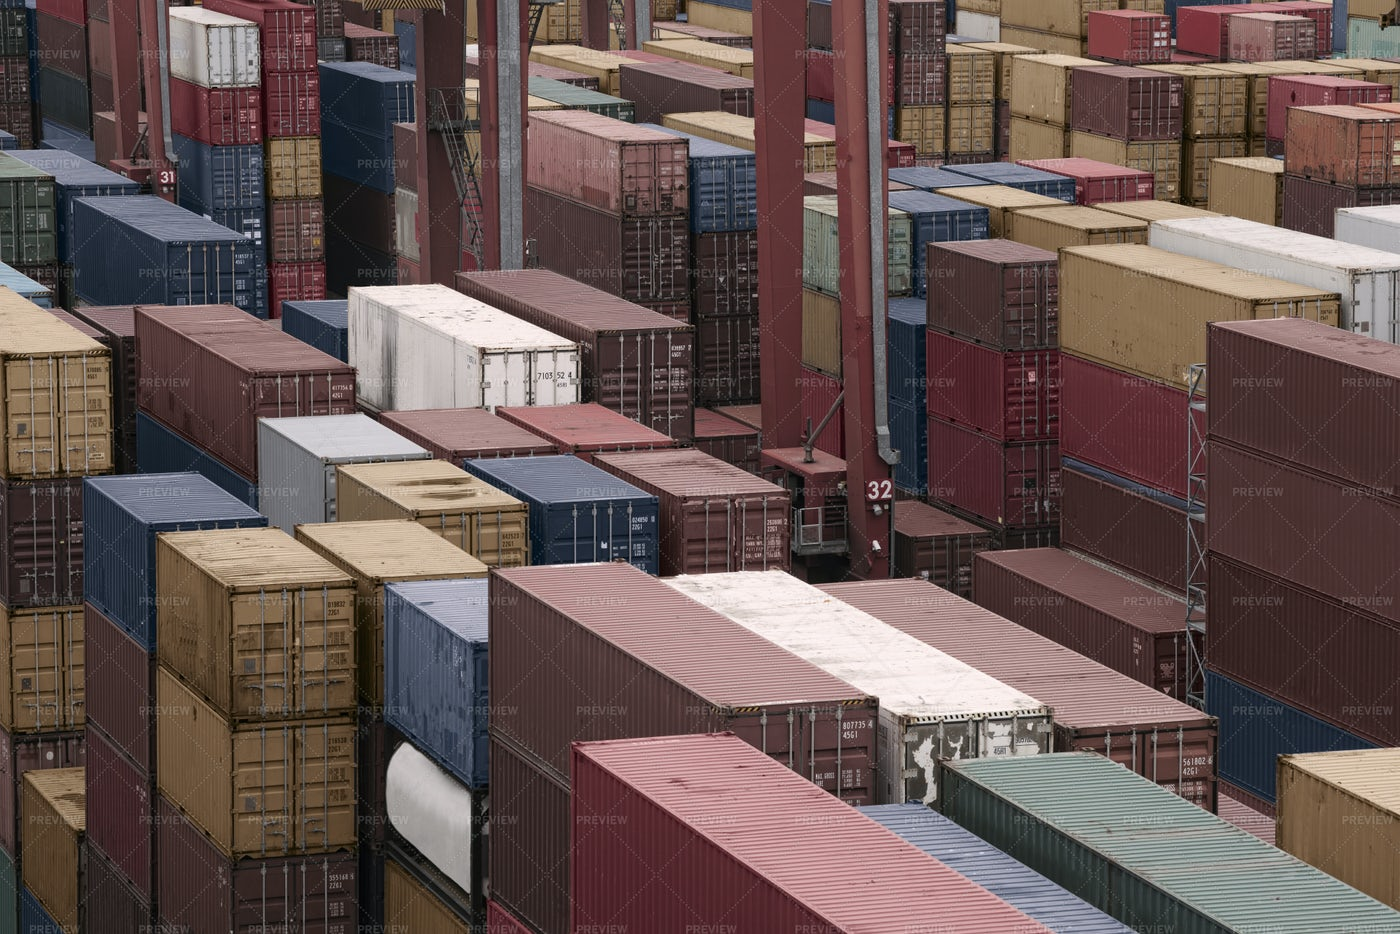 Containers In Cargo Shipyard: Stock Photos